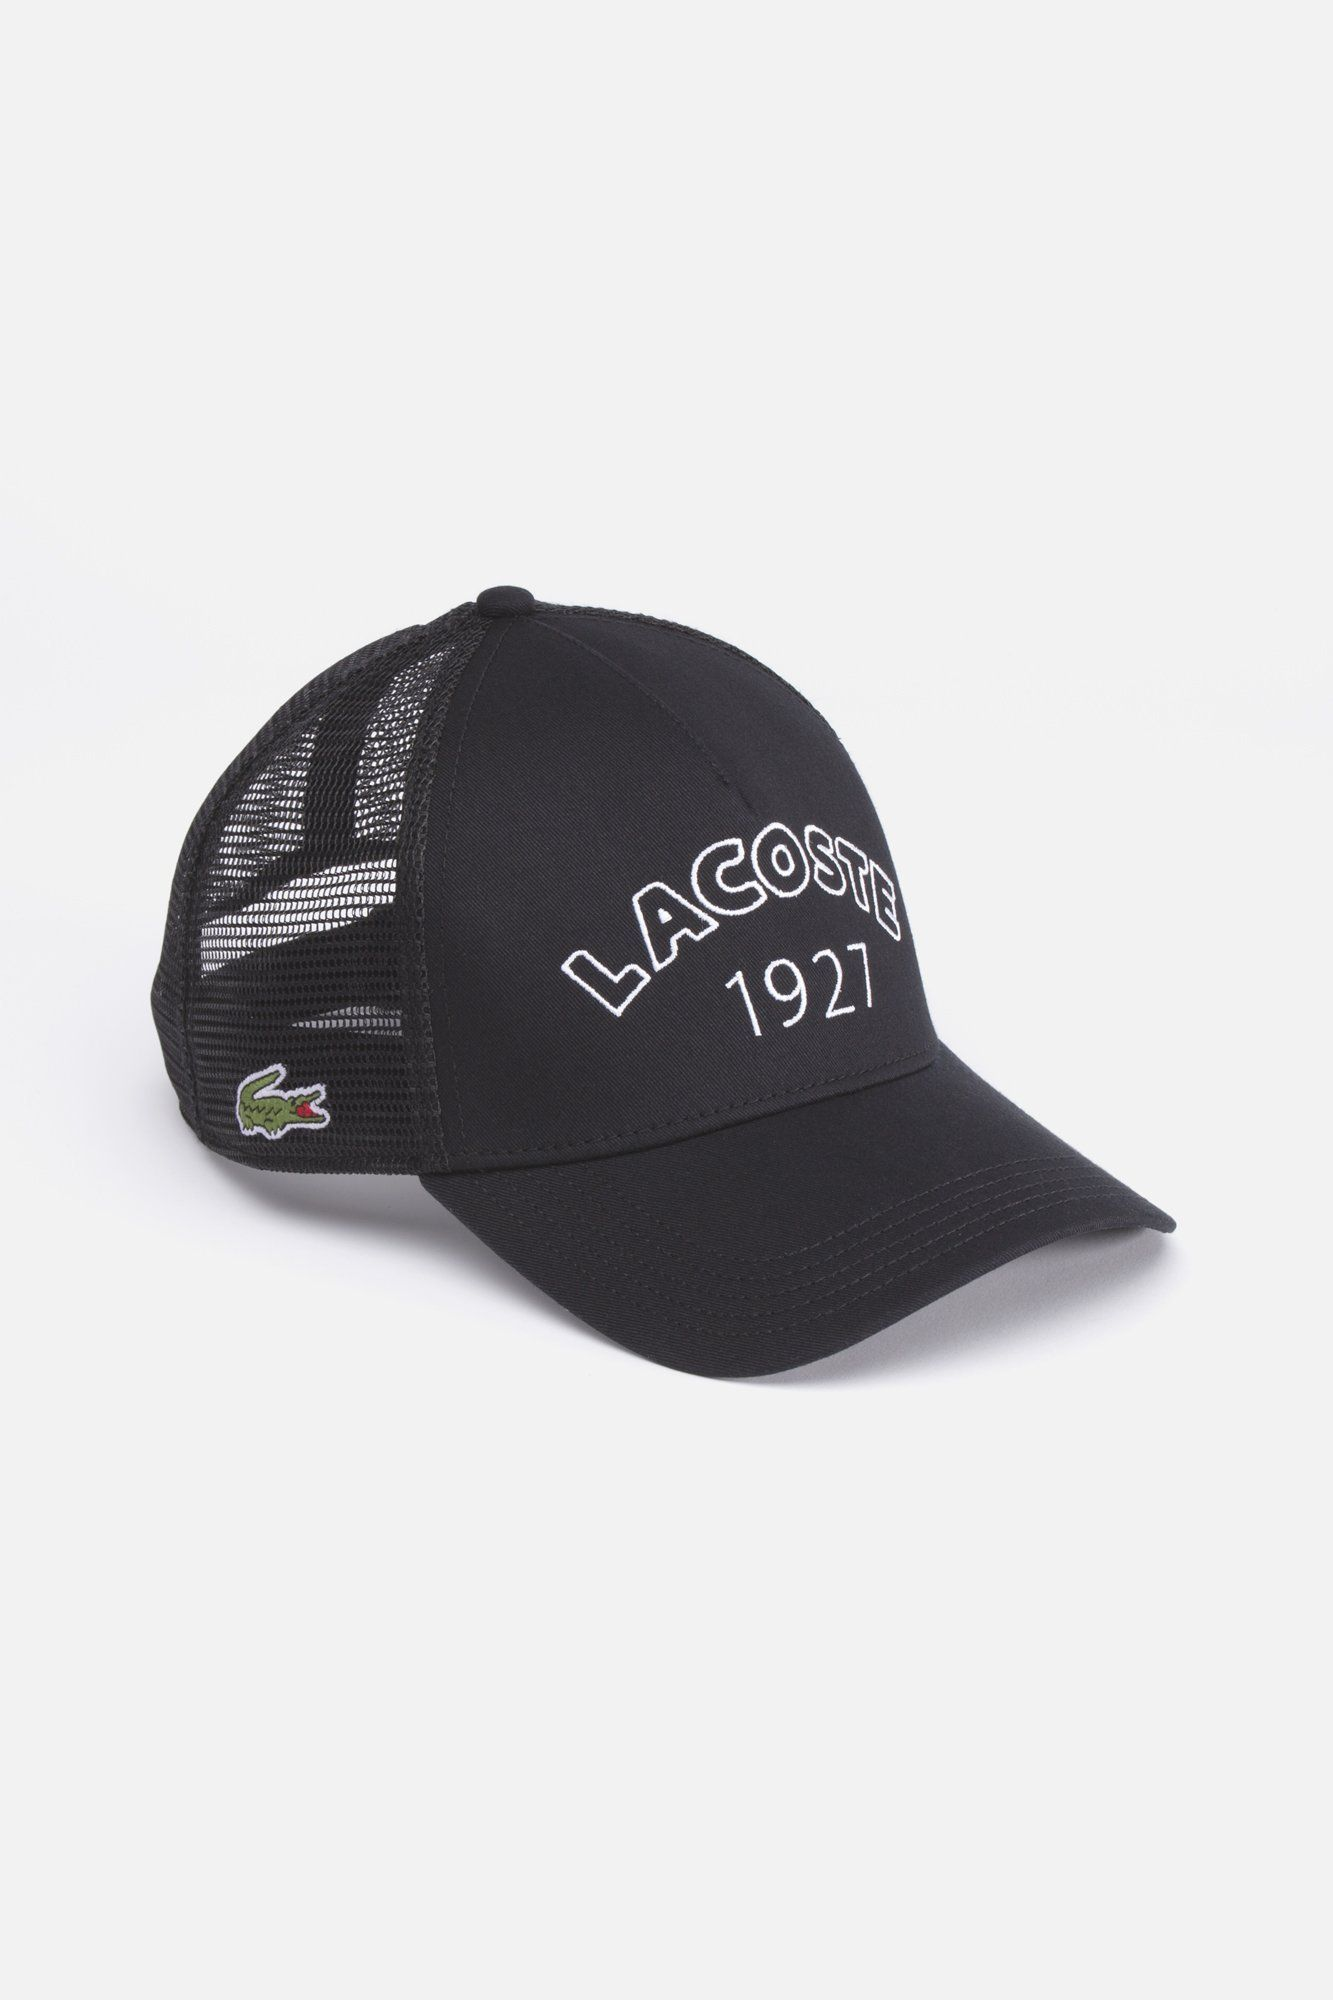 b61c3f25f4c Lacoste Men s 1927 Trucker Cap   Caps   Hats